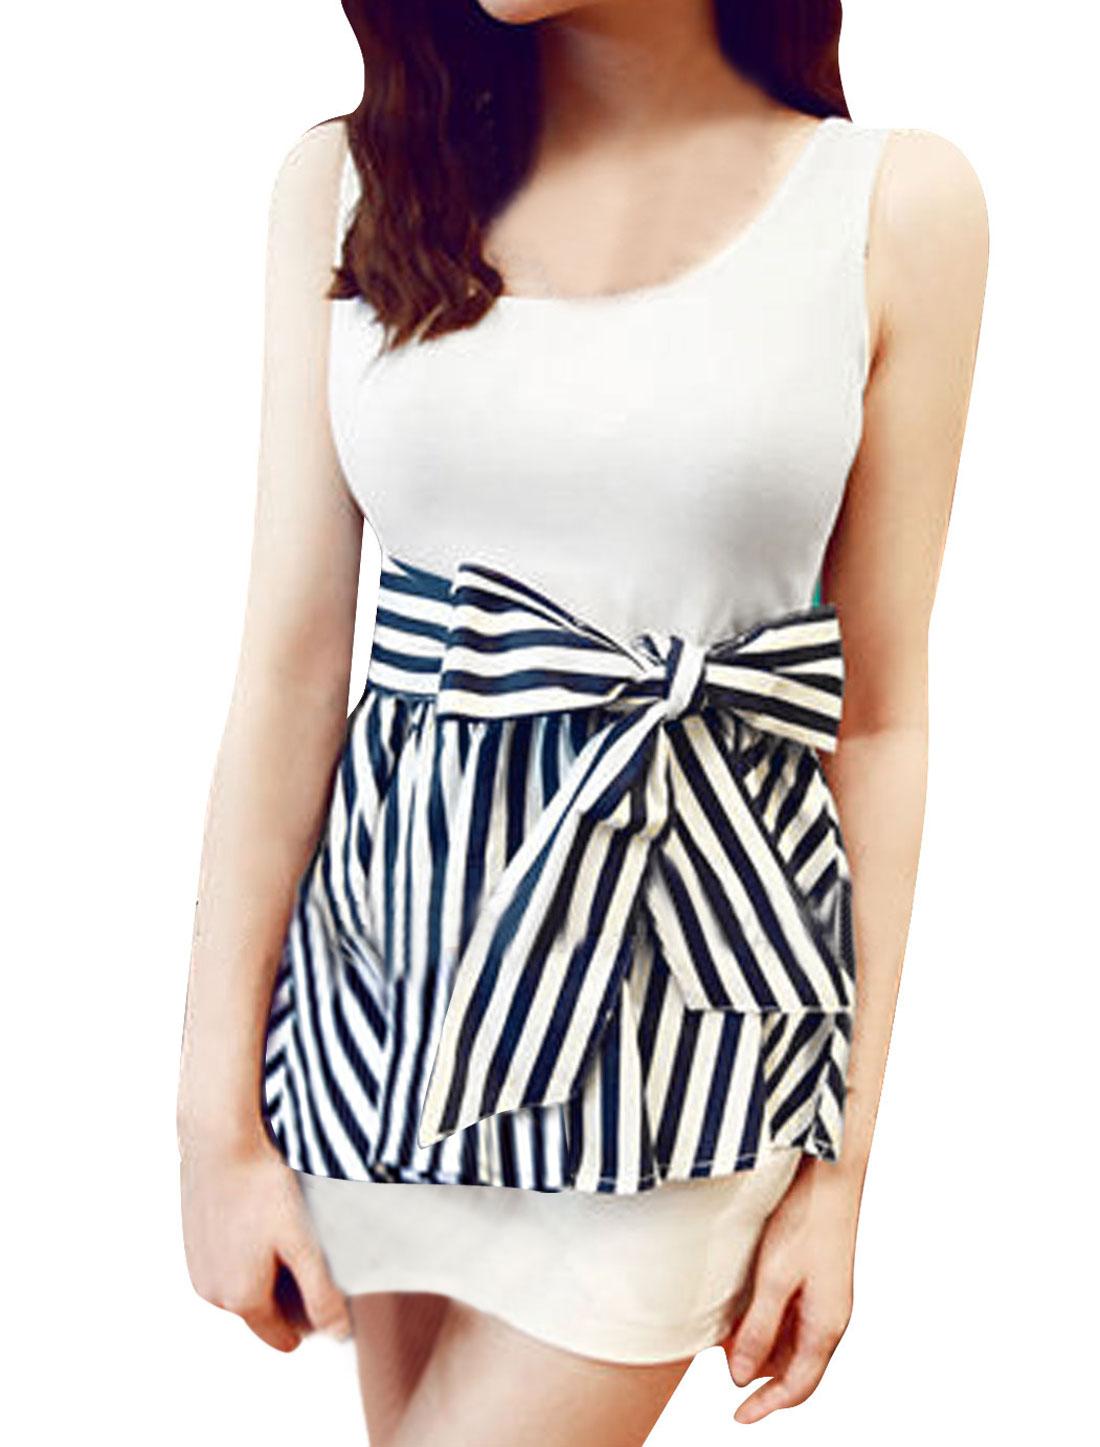 Lady Pullover Elastic Waist Stripes Top w Waist Strap White Dark Blue XS